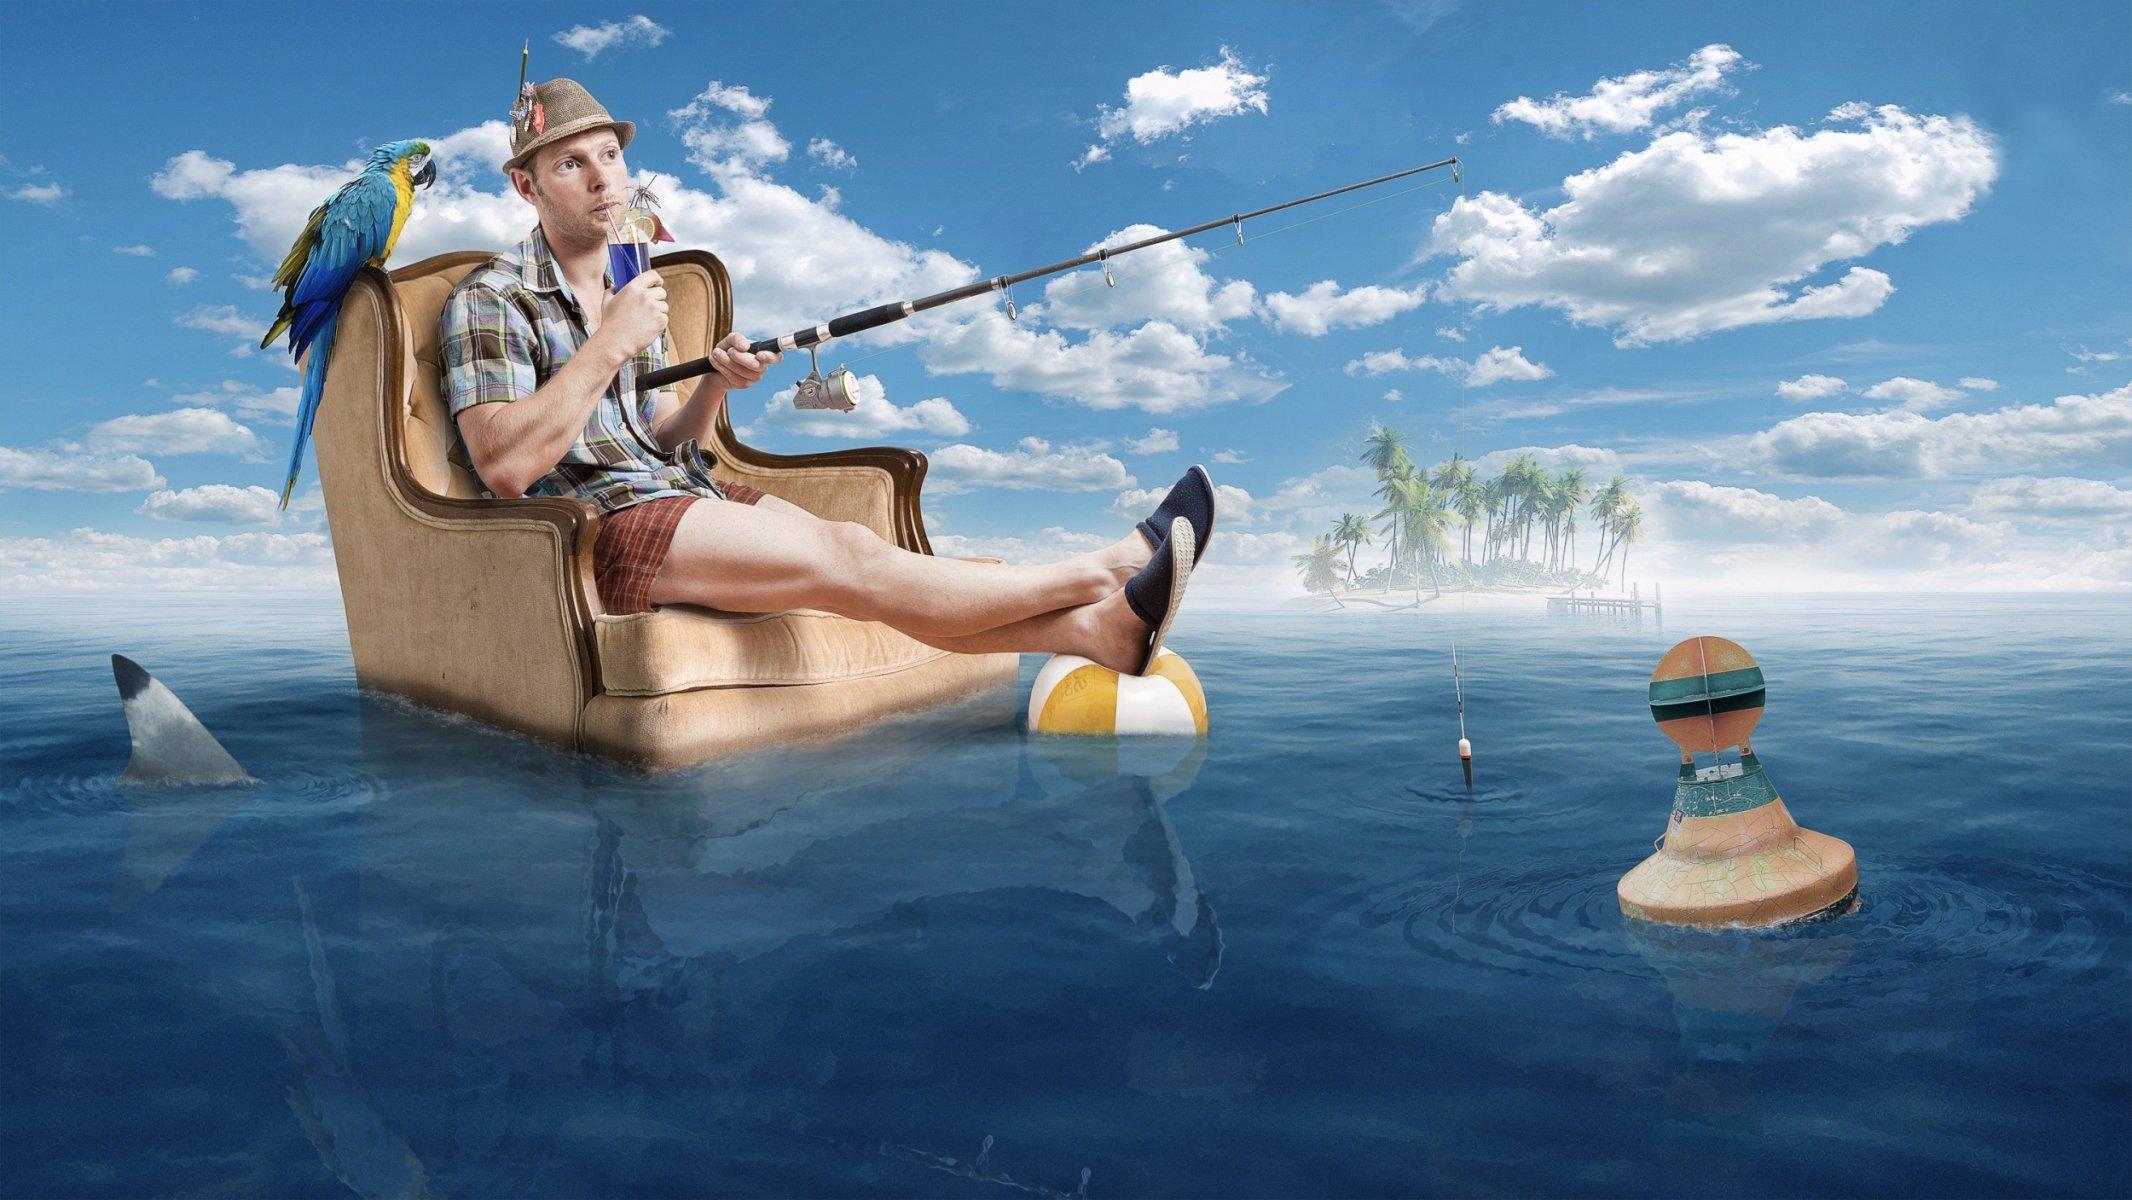 вначале смешная картинка рыбак на лодке вклад